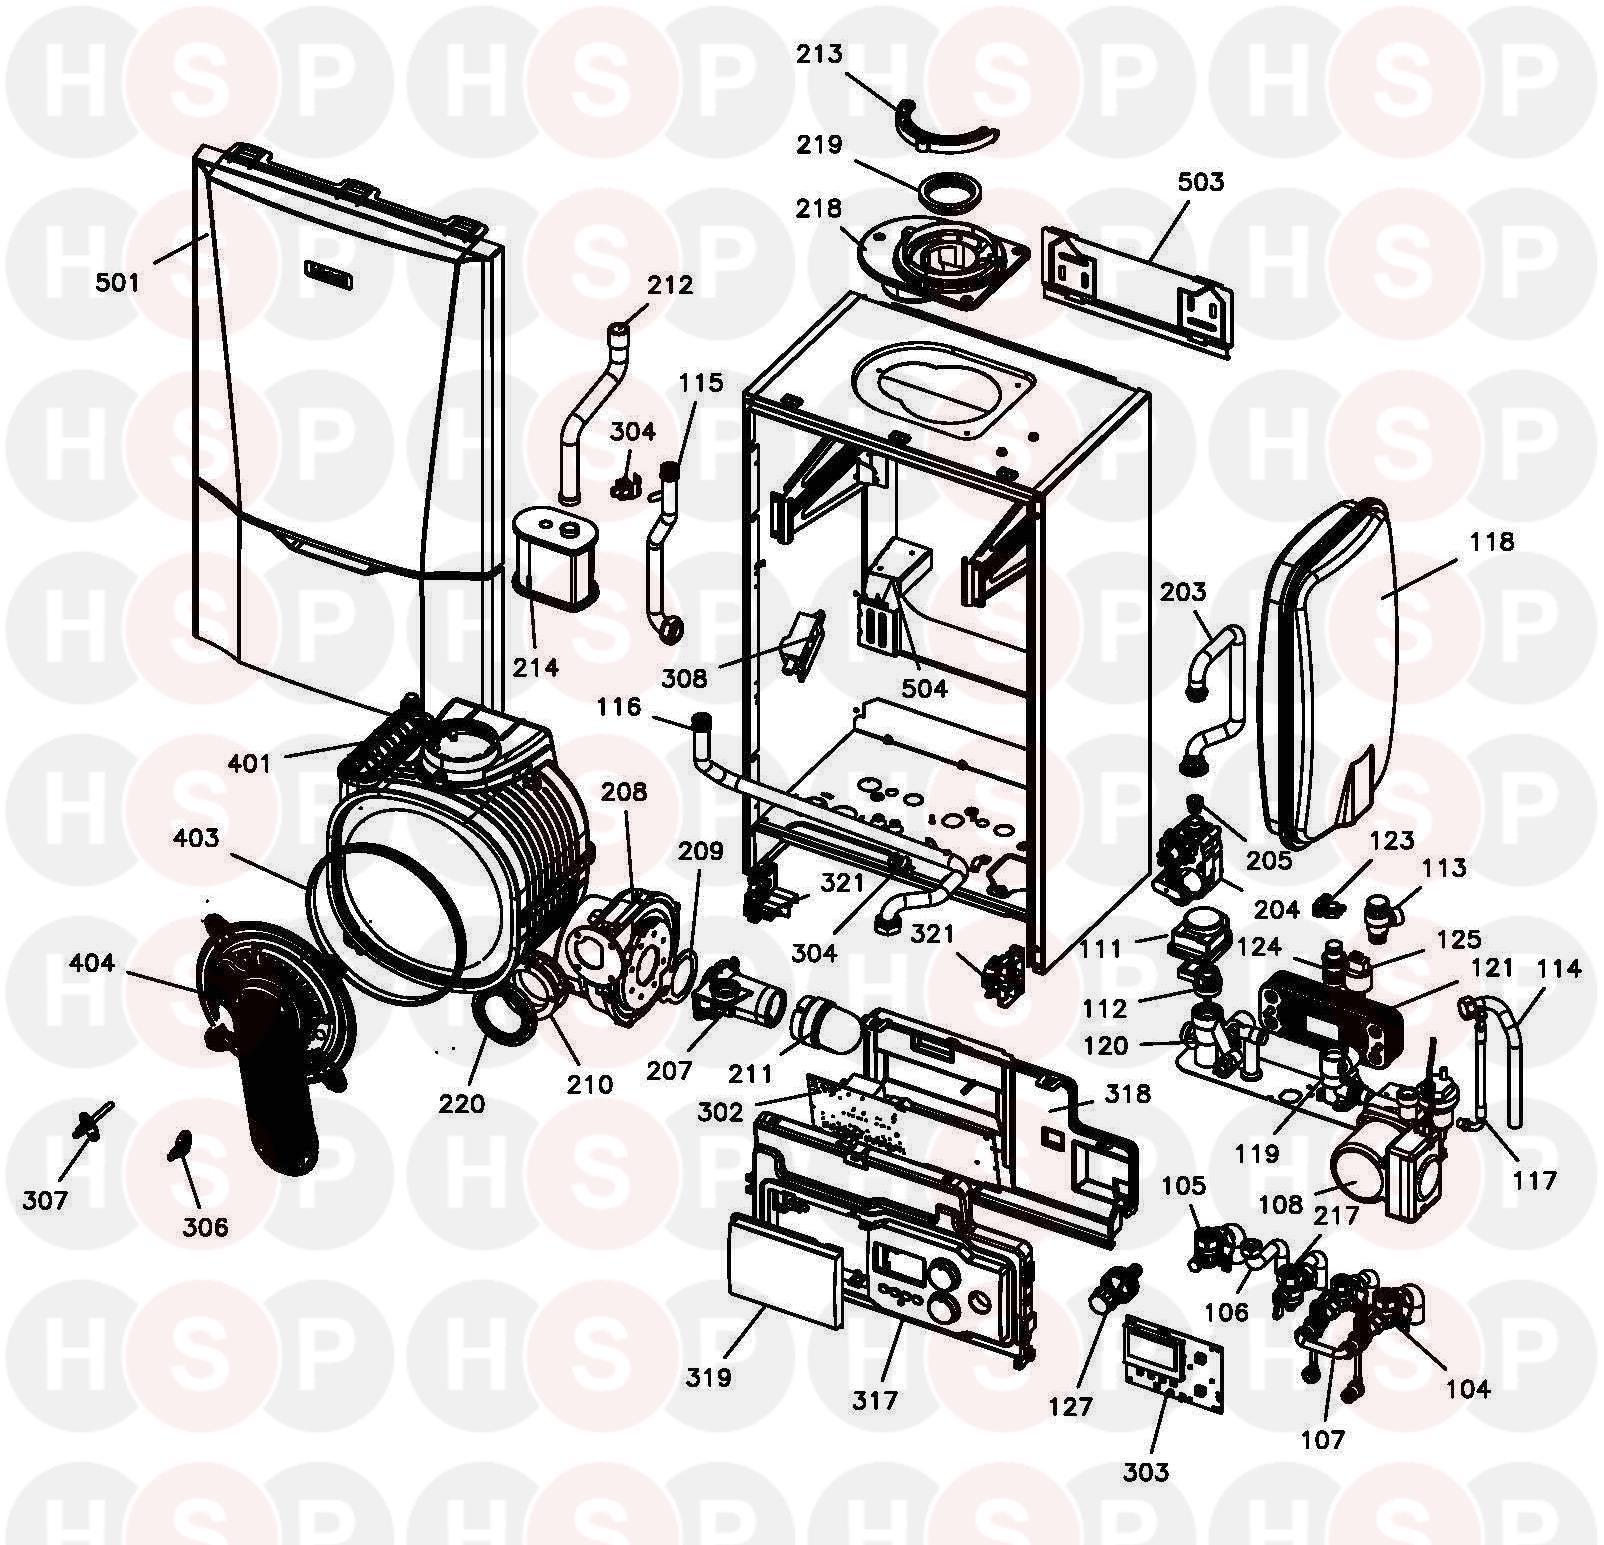 Imagehandler on Ford Boss Plow Wiring Diagram